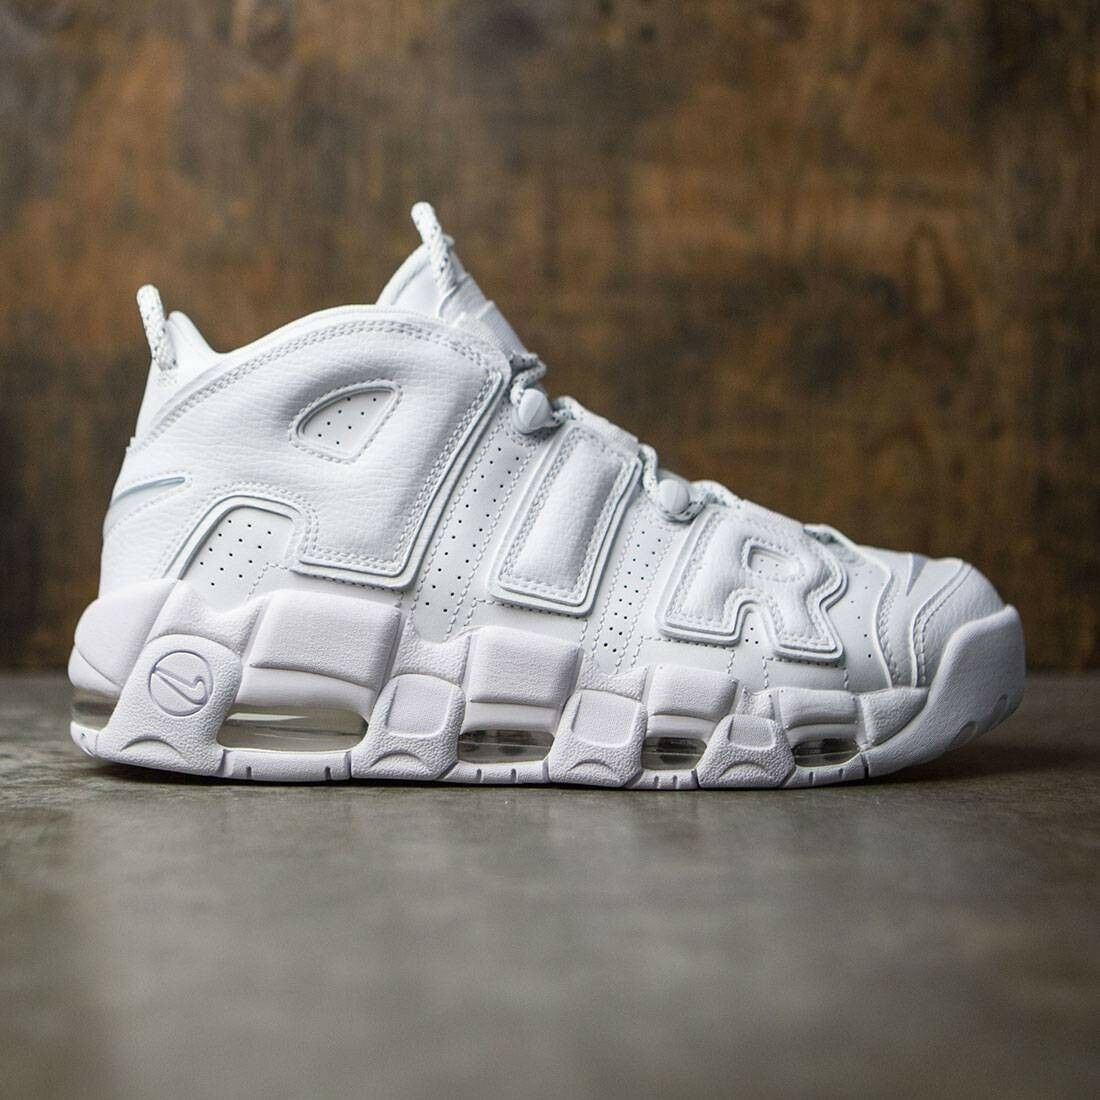 Nike Air More Uptempo Retro Triple White Size 8. 921948-100 Jordan Pippen Kobe